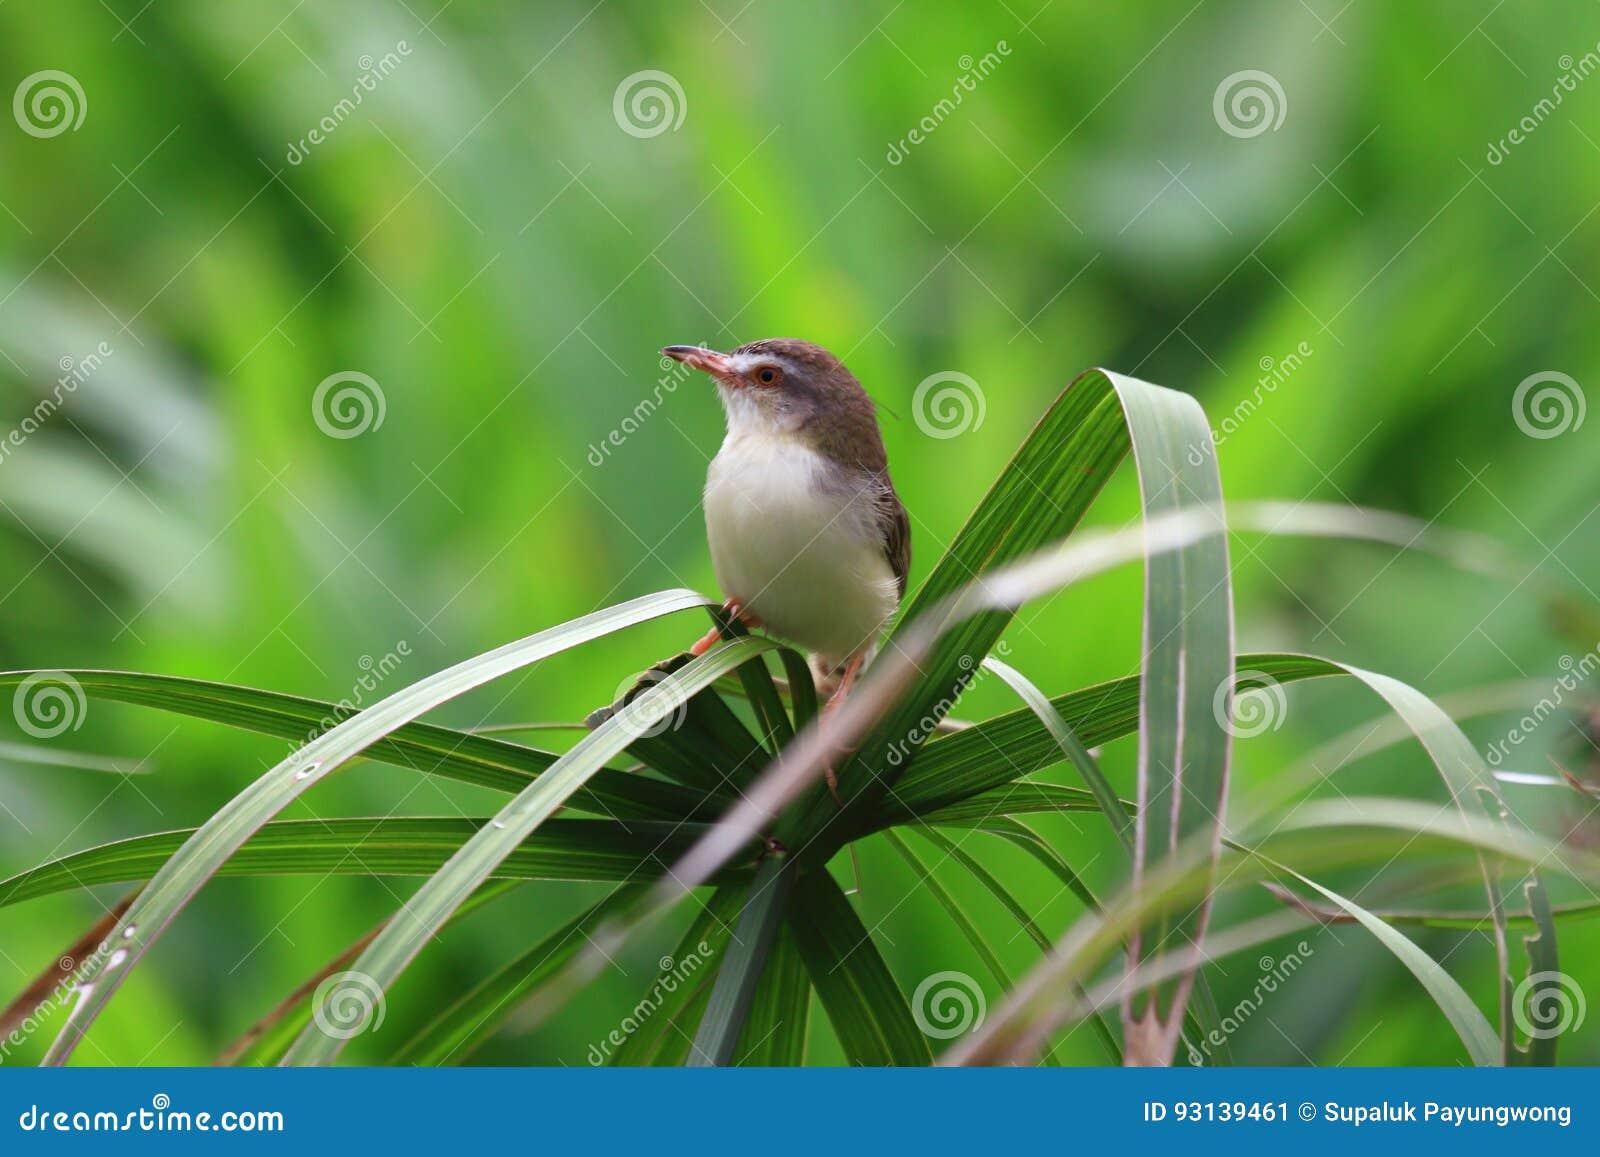 Sastre-pájaro común en hoja de palma